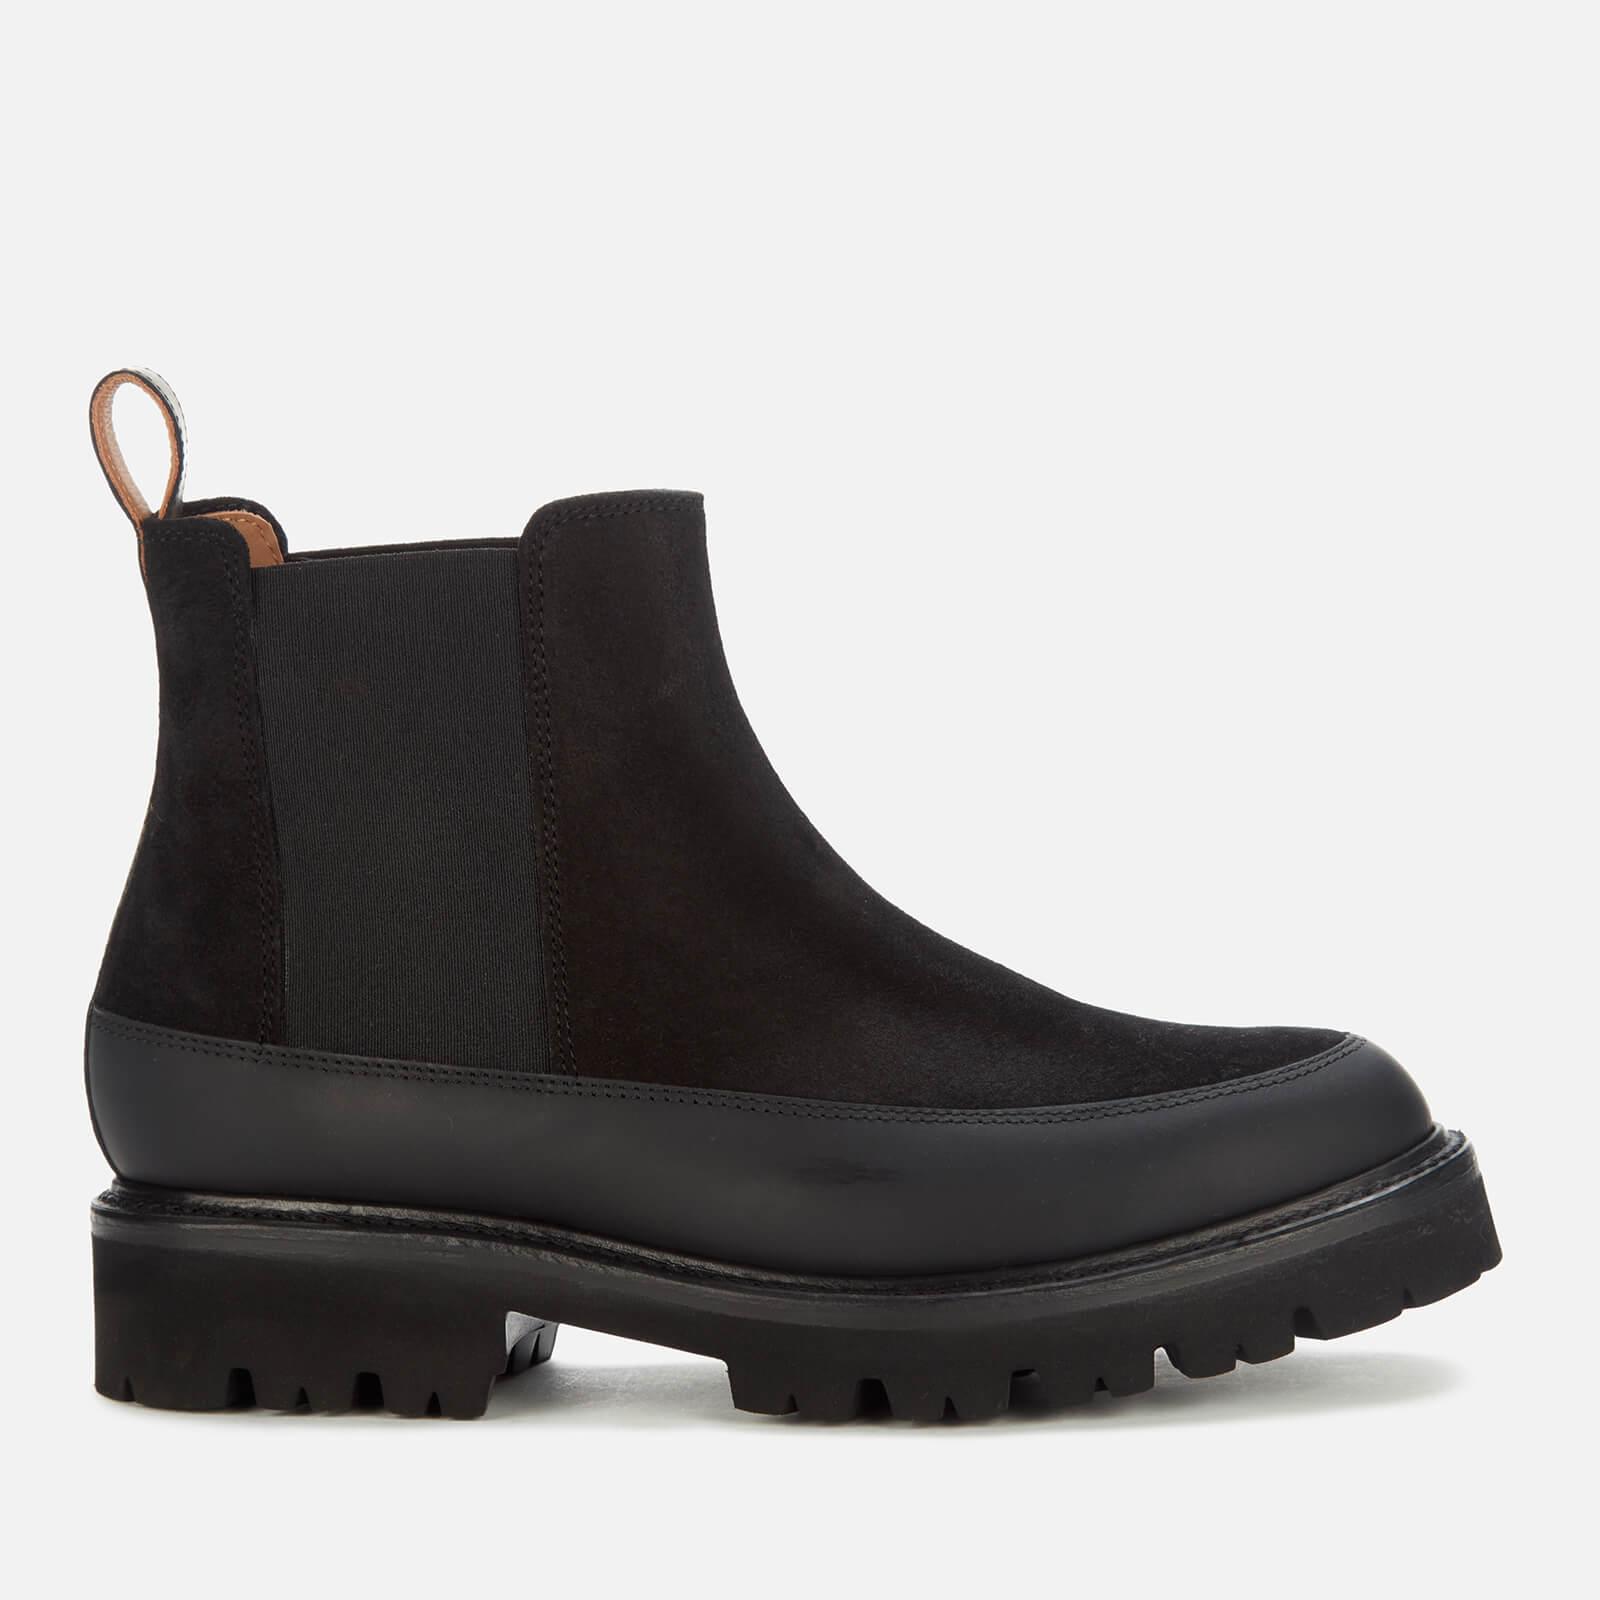 Grenson Women's Abbie Suede/Rubber Chelsea Boots - Black - Uk 3